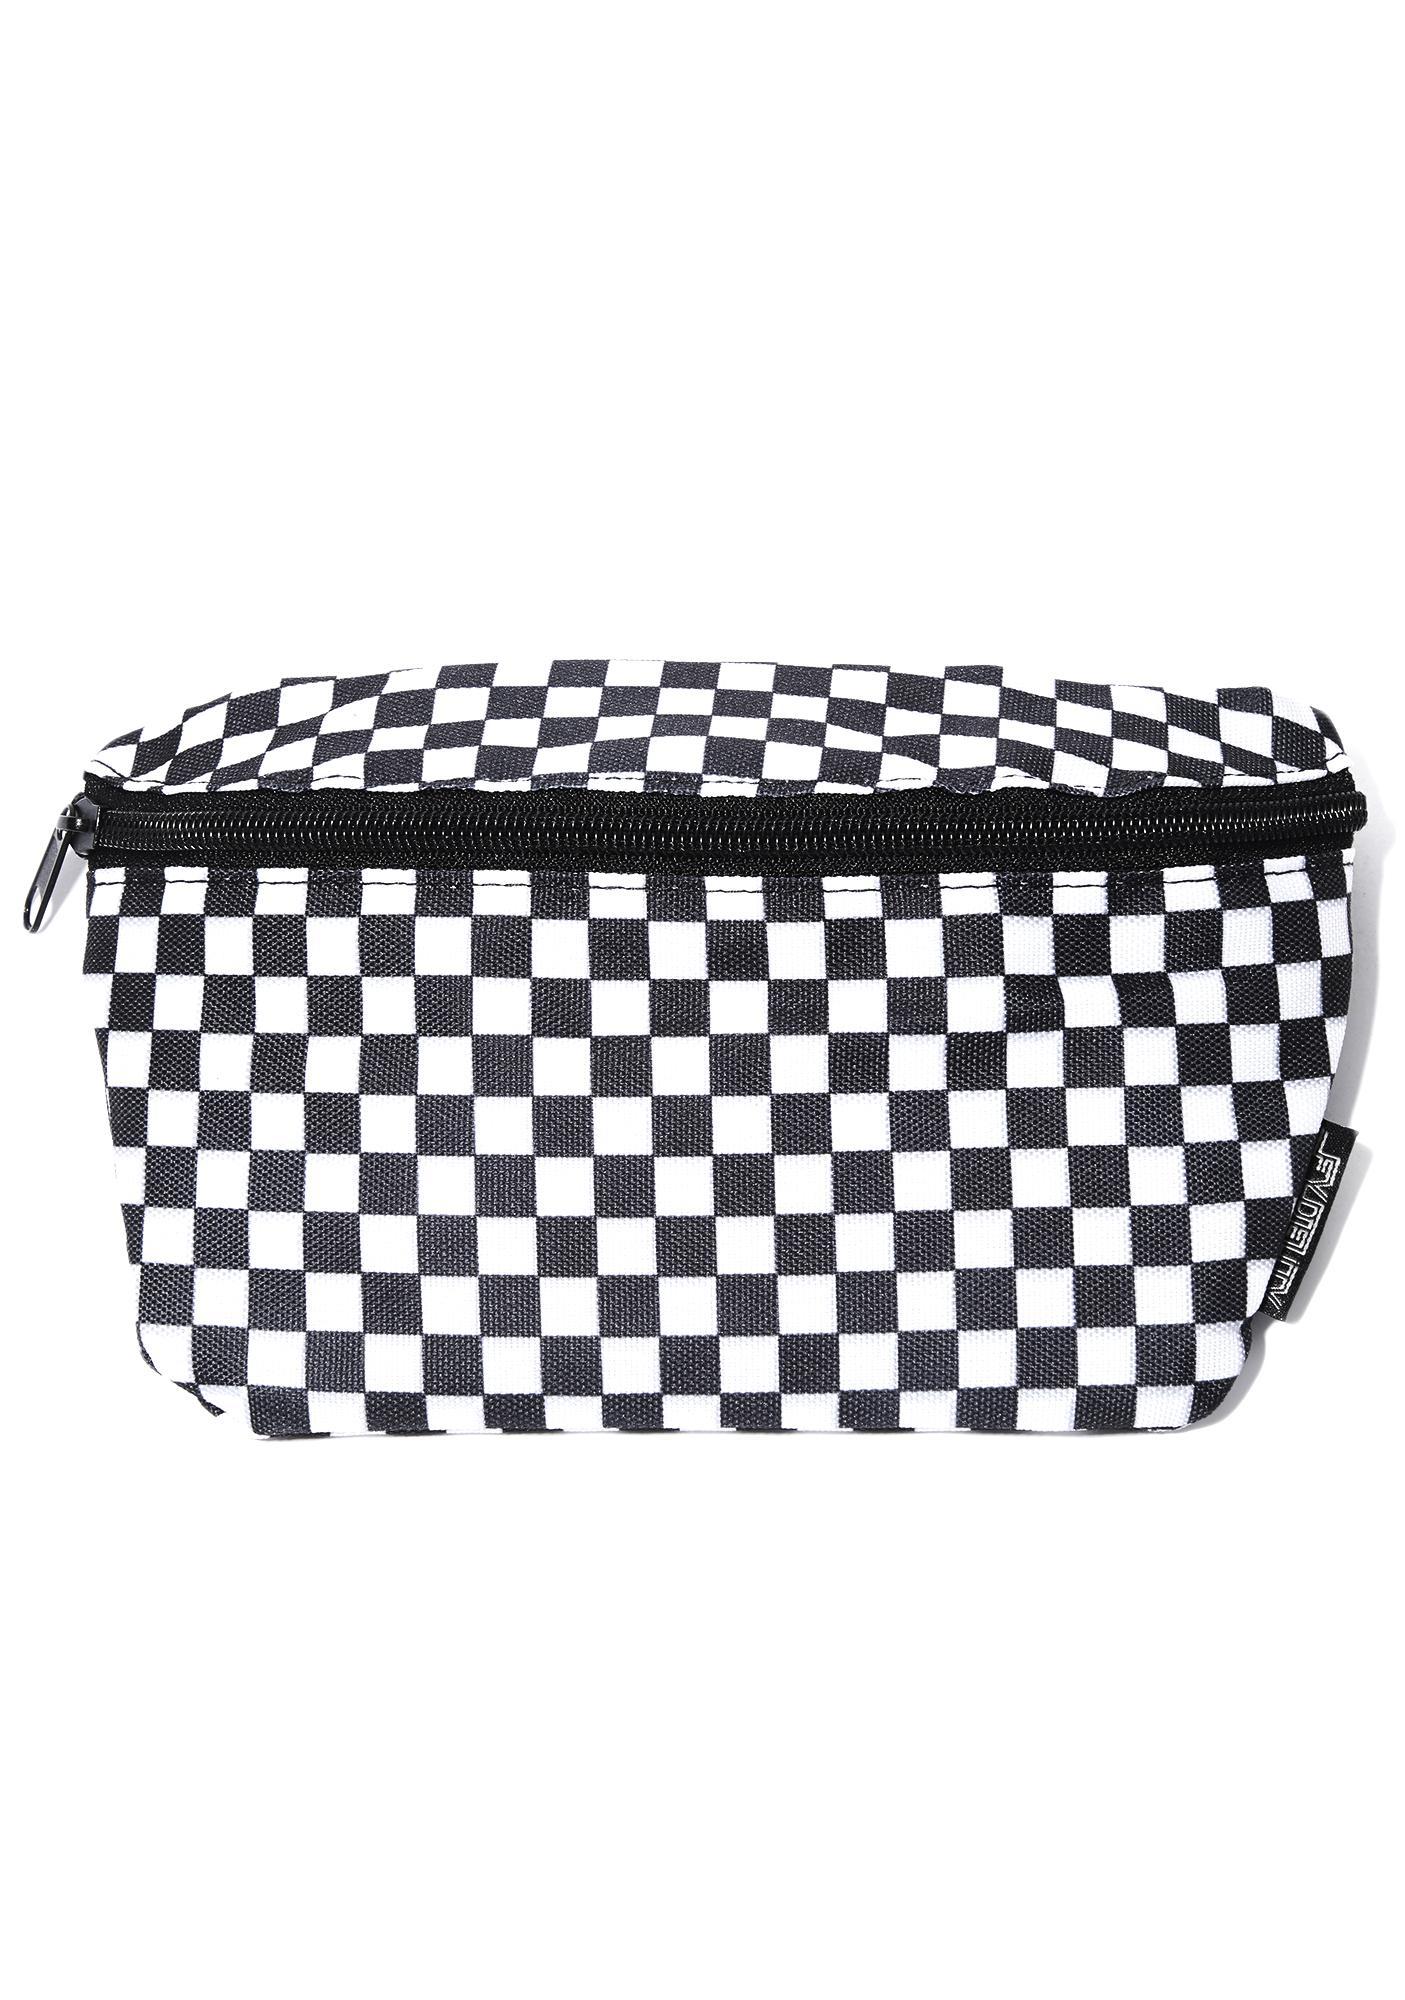 Raceway Checkered Fanny Pack